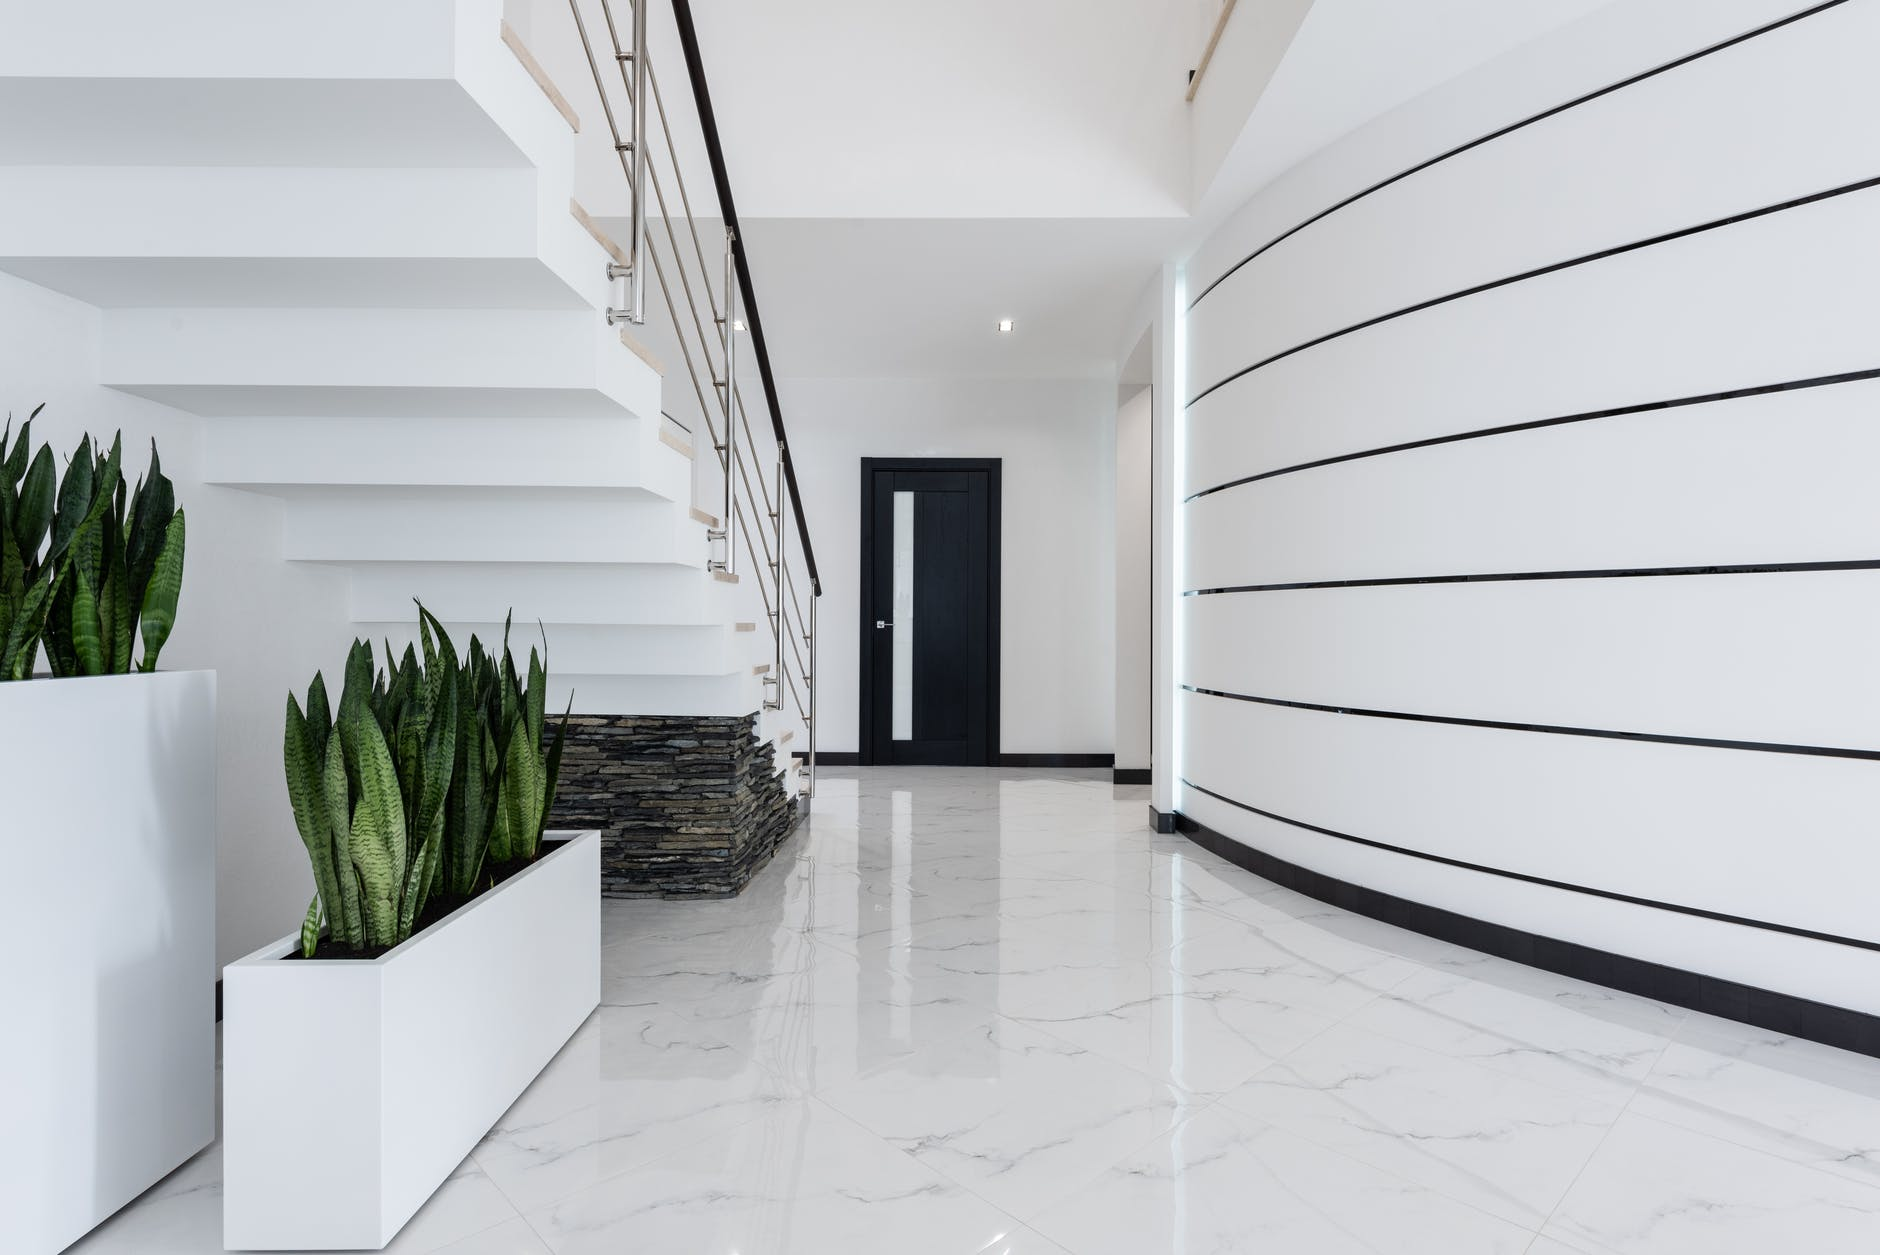 schody, interiér